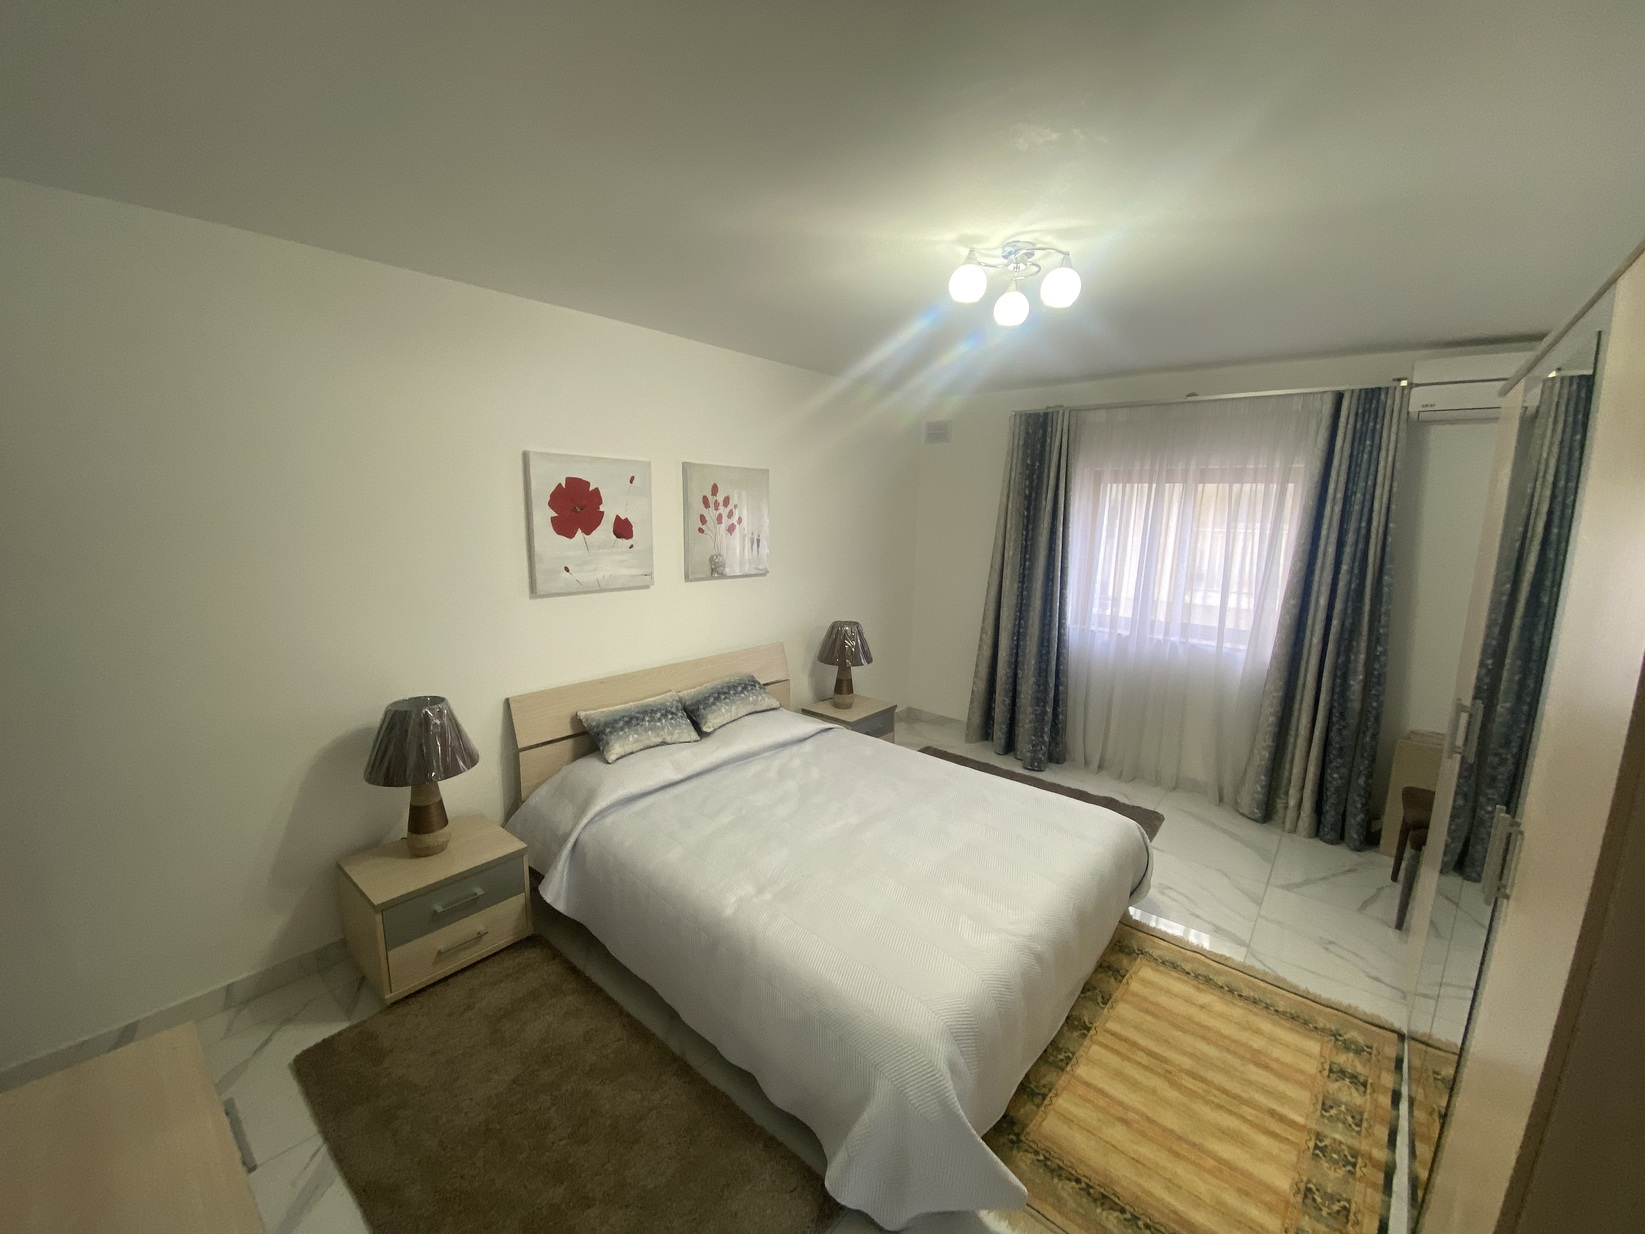 3 bed Apartment For Rent in Qawra, Qawra - thumb 14